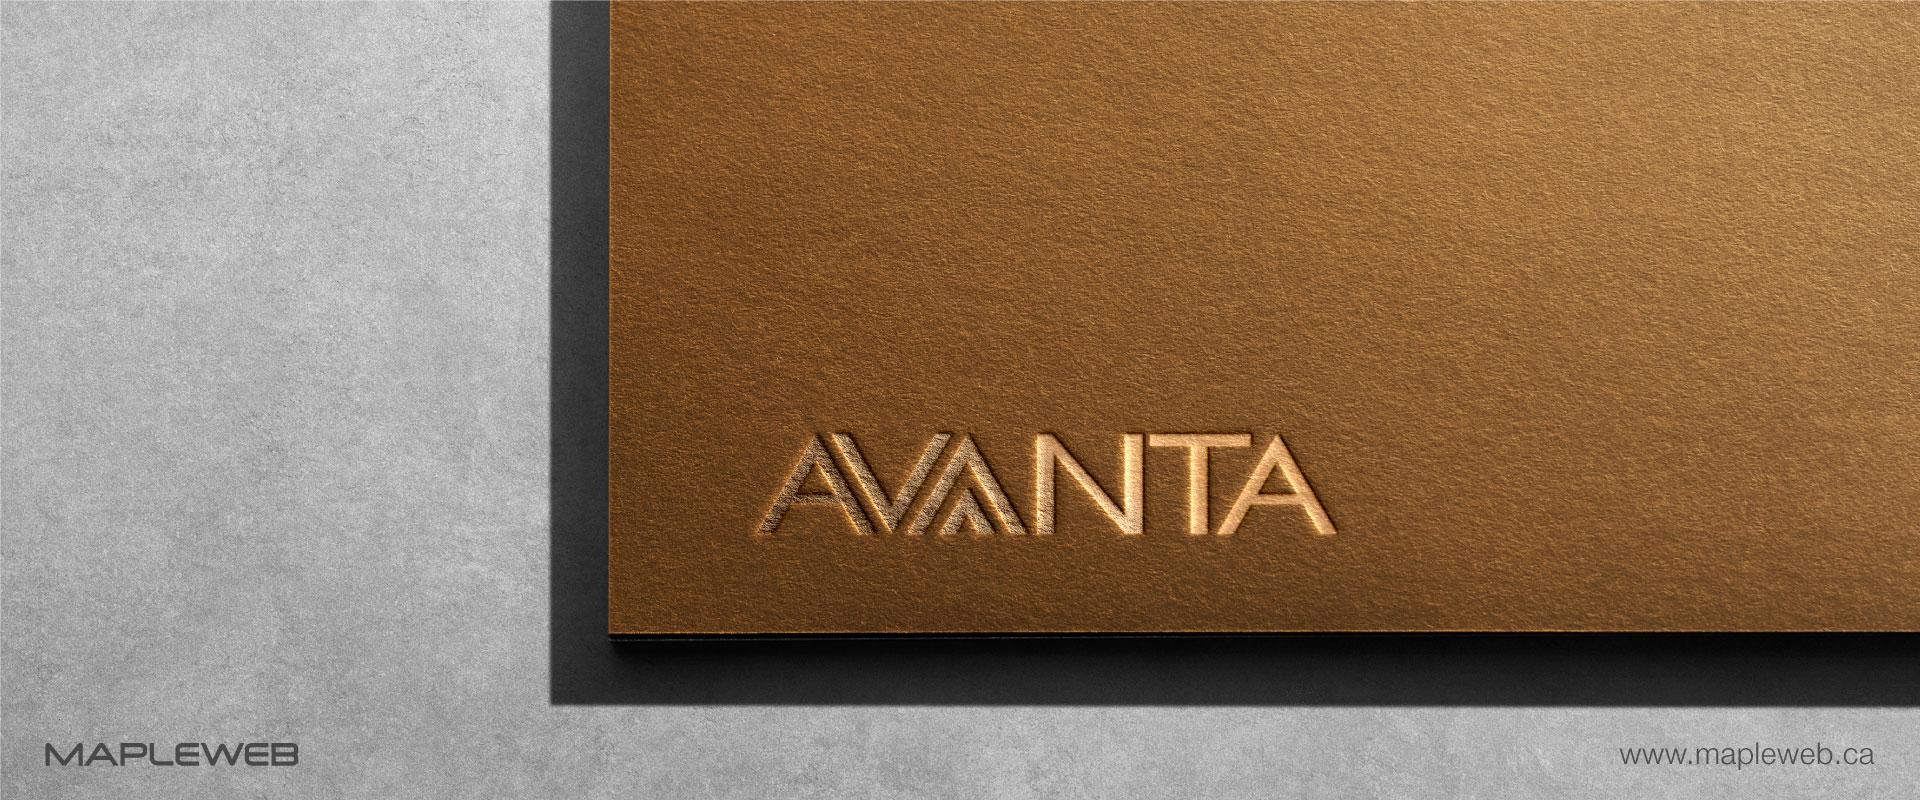 avanta-brand-logo-design-by-mapleweb-vancouver-canada-paper-gold-mock